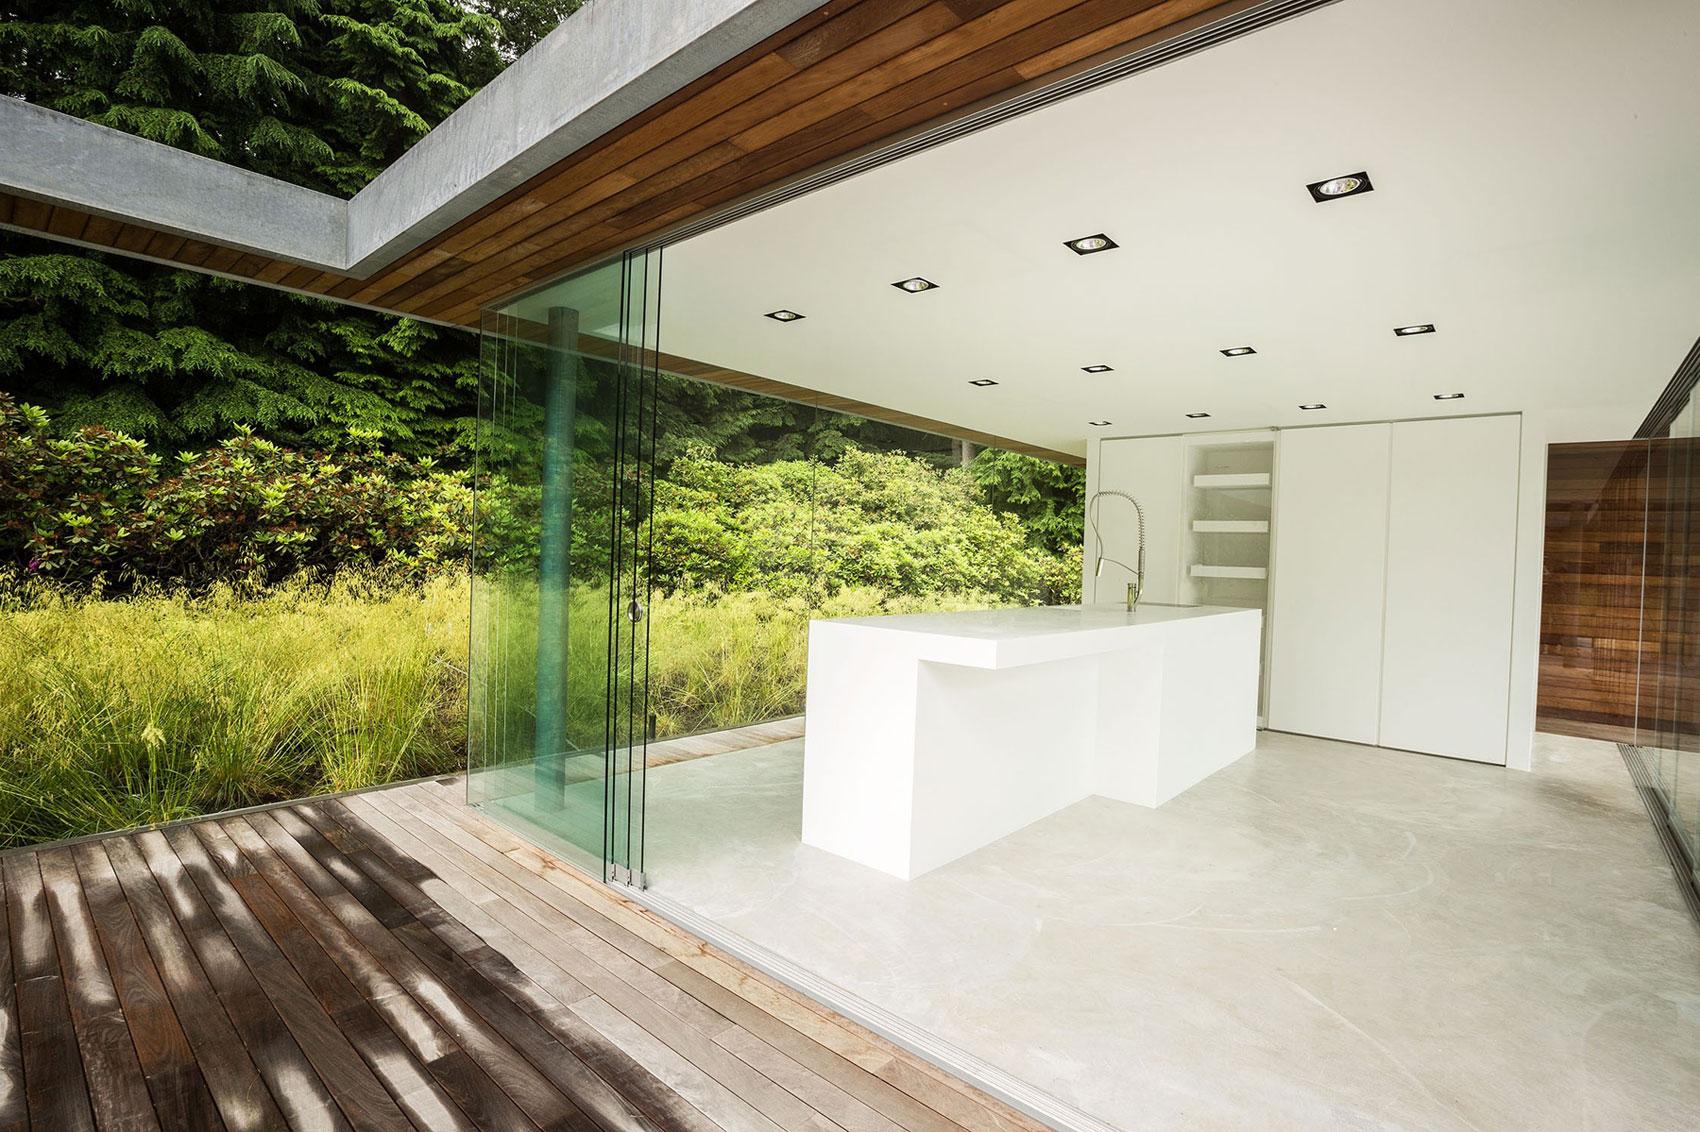 Modern Huizen Country House Located in a Quiet Rural Setting by De Brouwer Binnenwerk-07